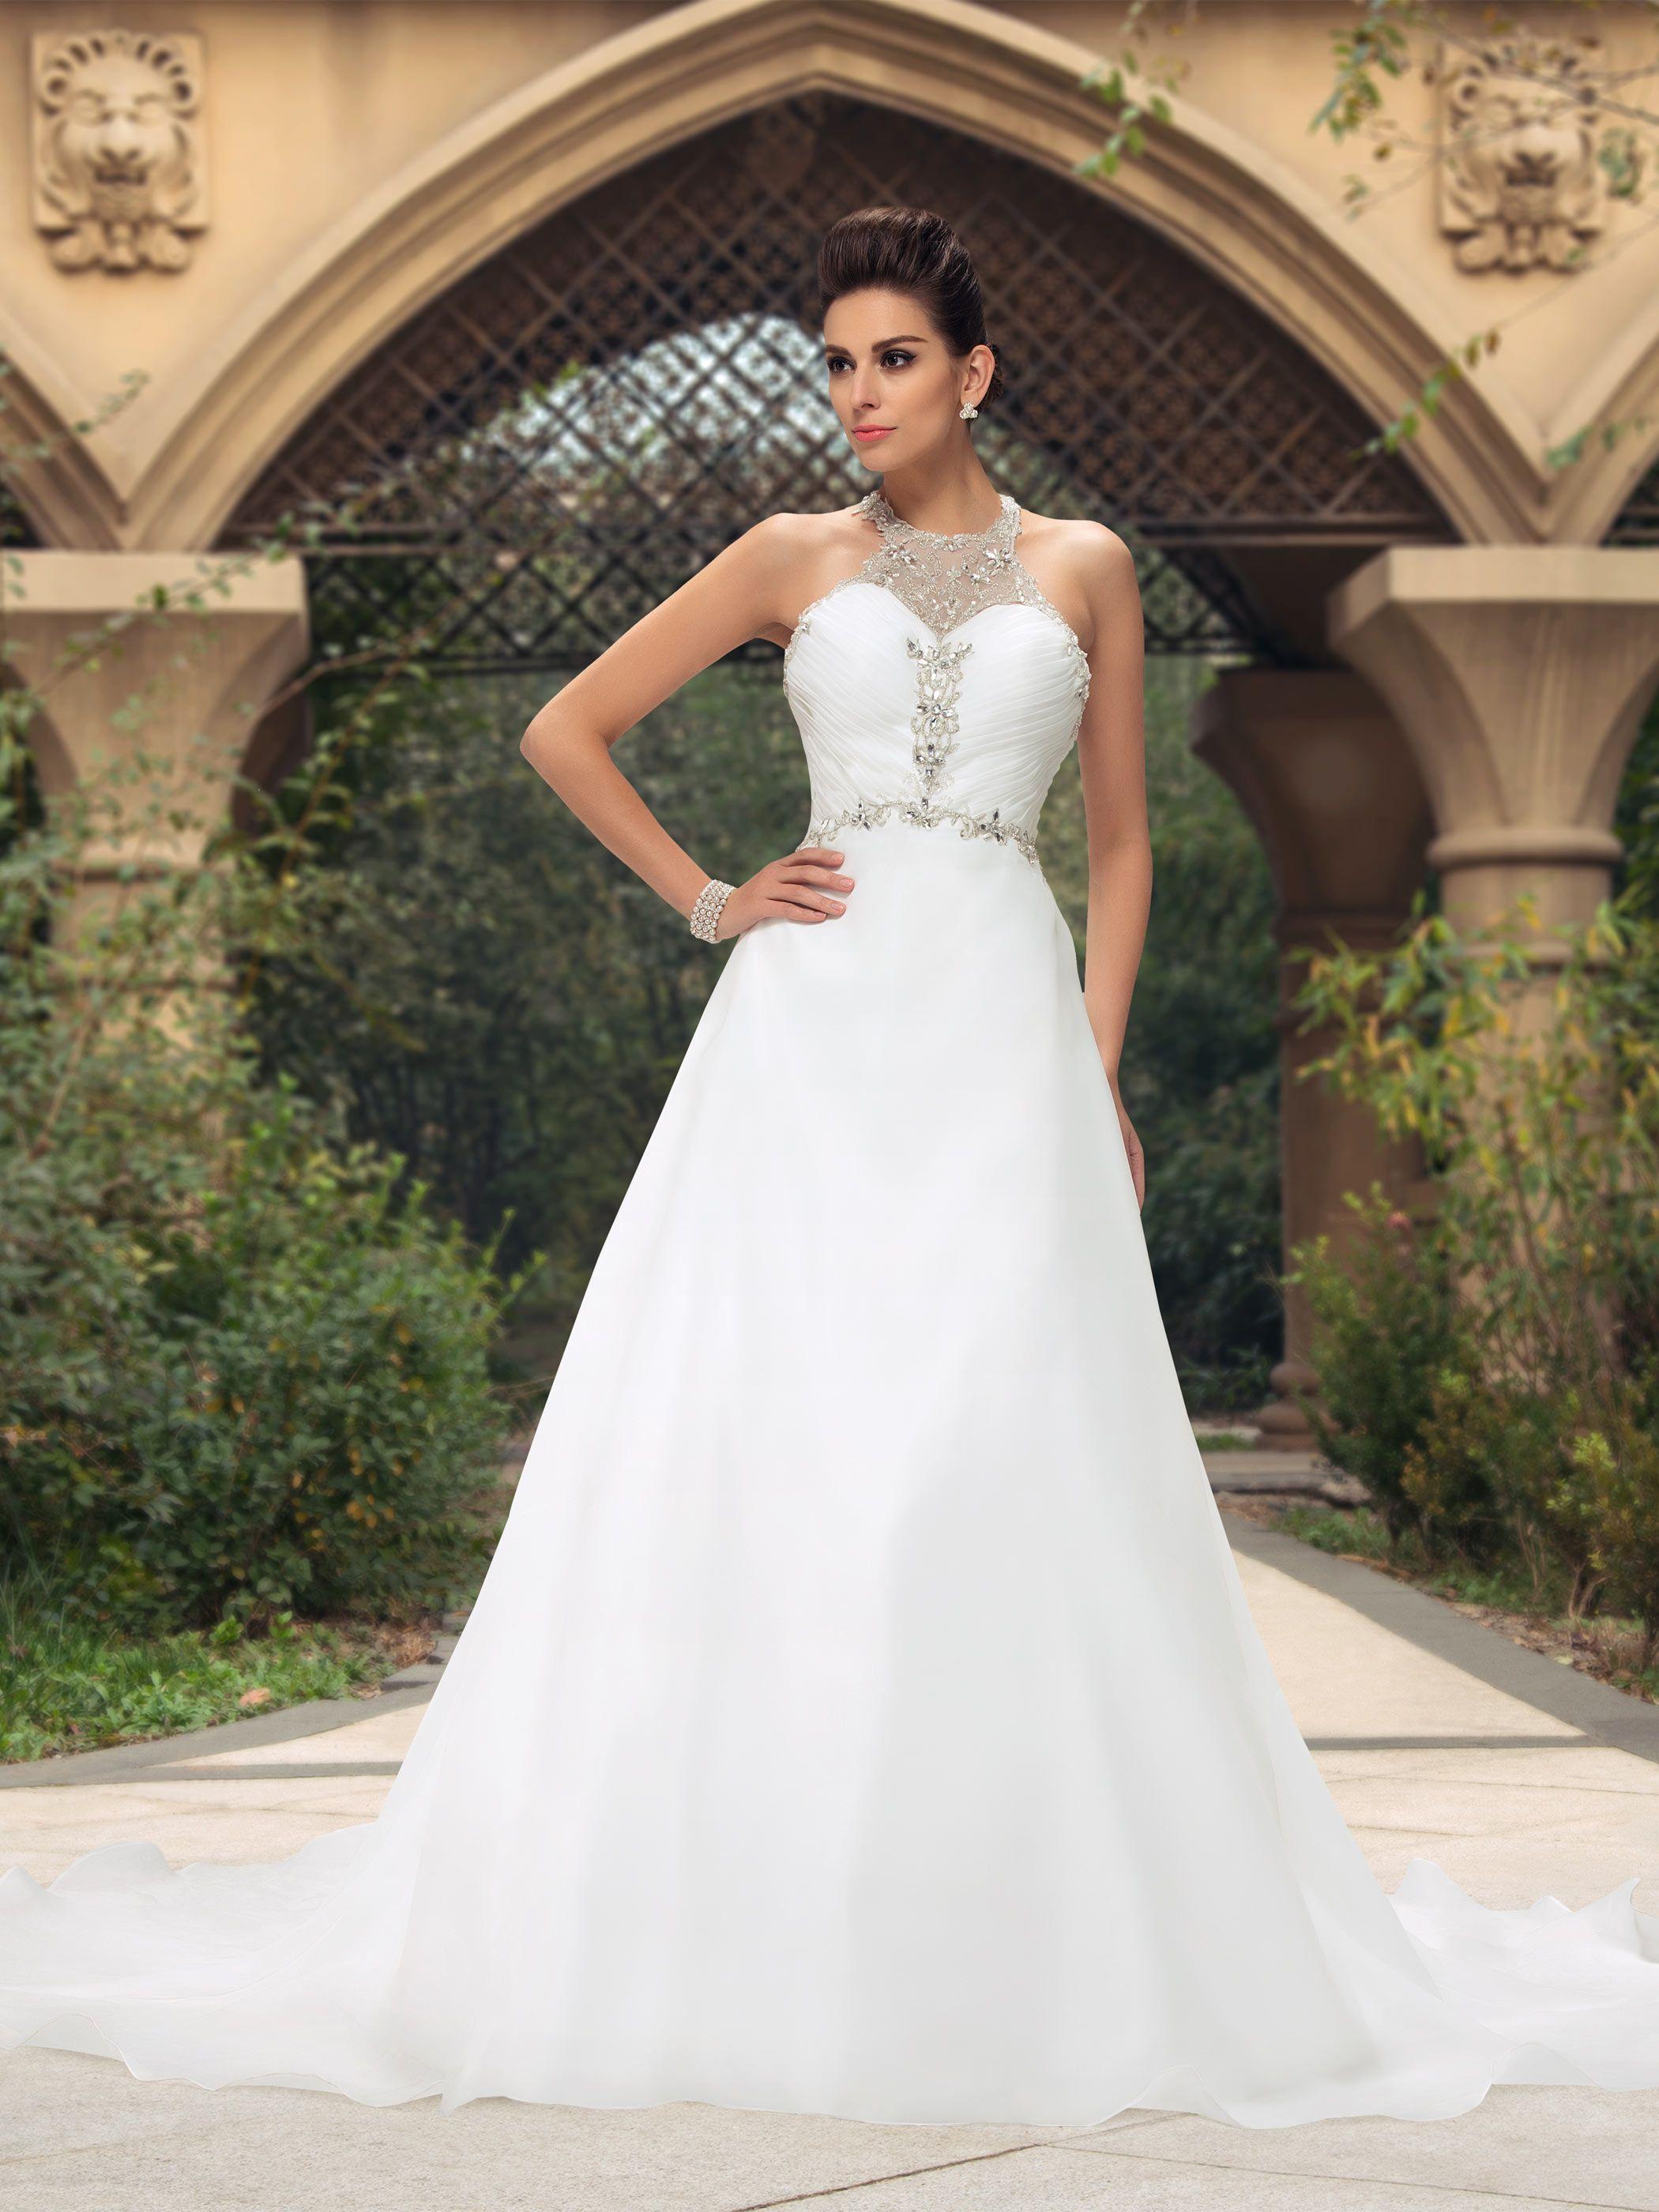 Pin on Wedding Dresses from TBDRESS®